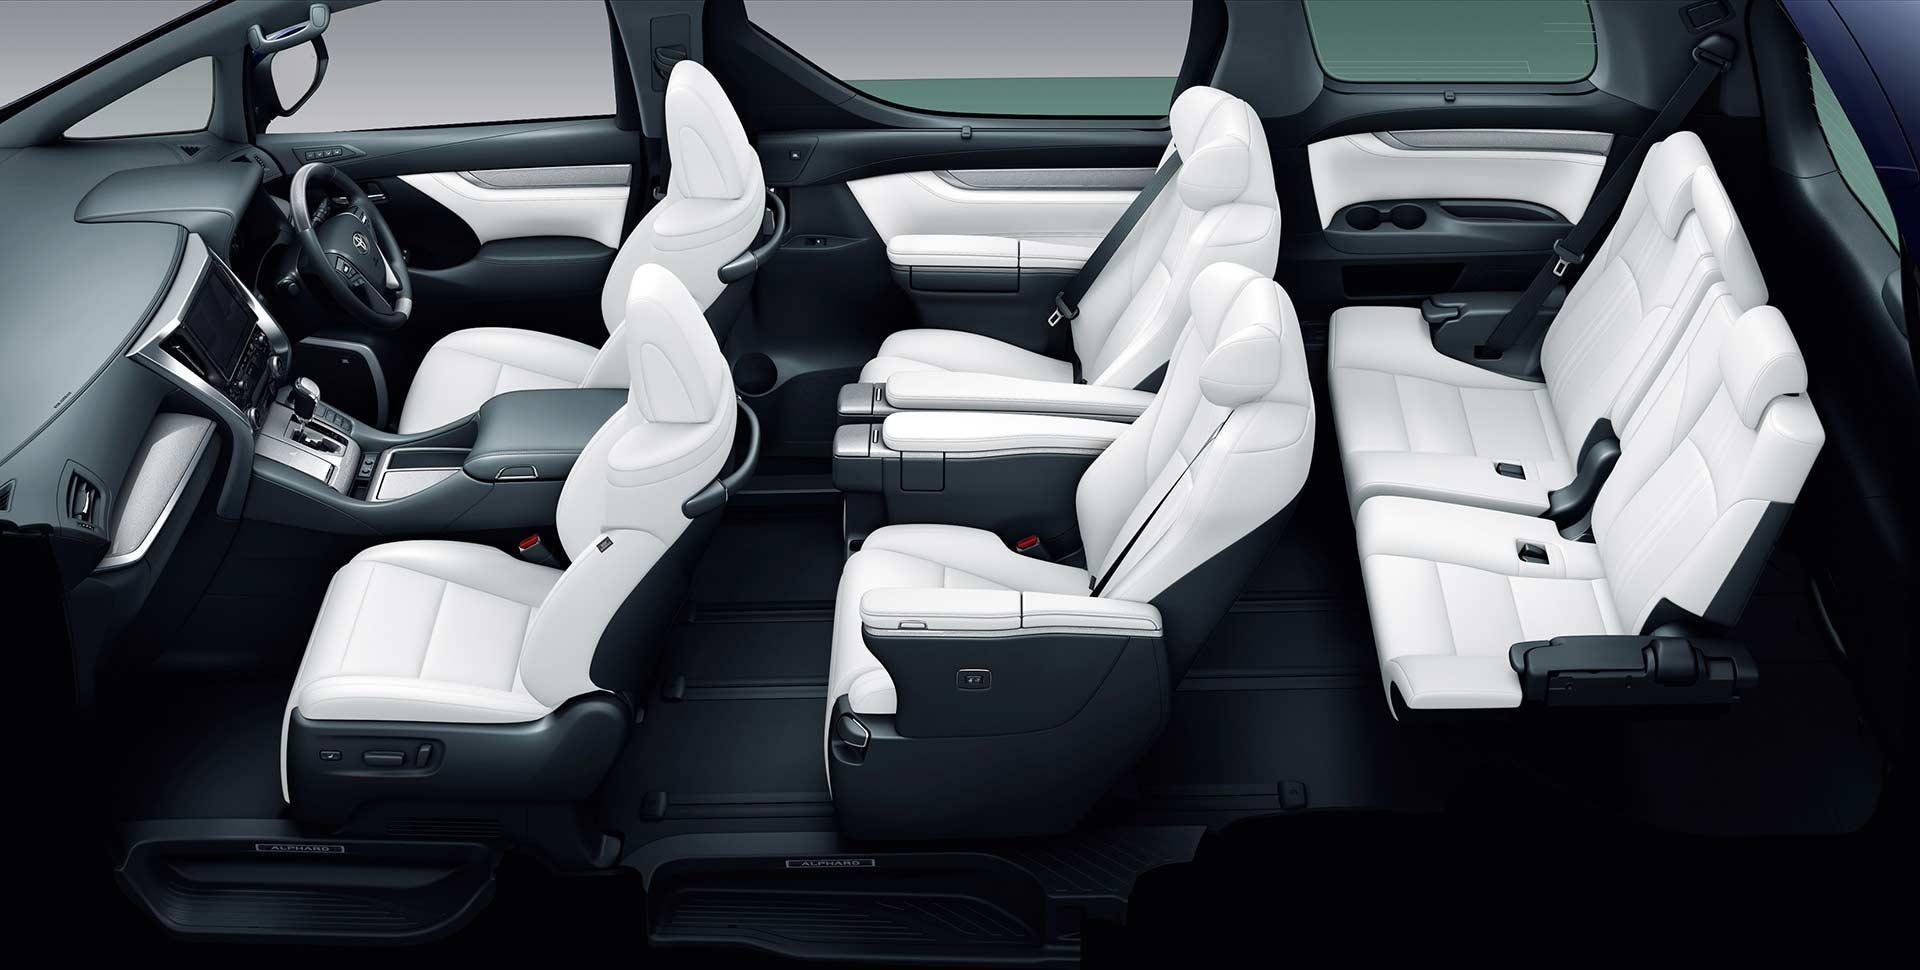 2018 Toyota Alphard And Vellfire Unveiled Autodevot